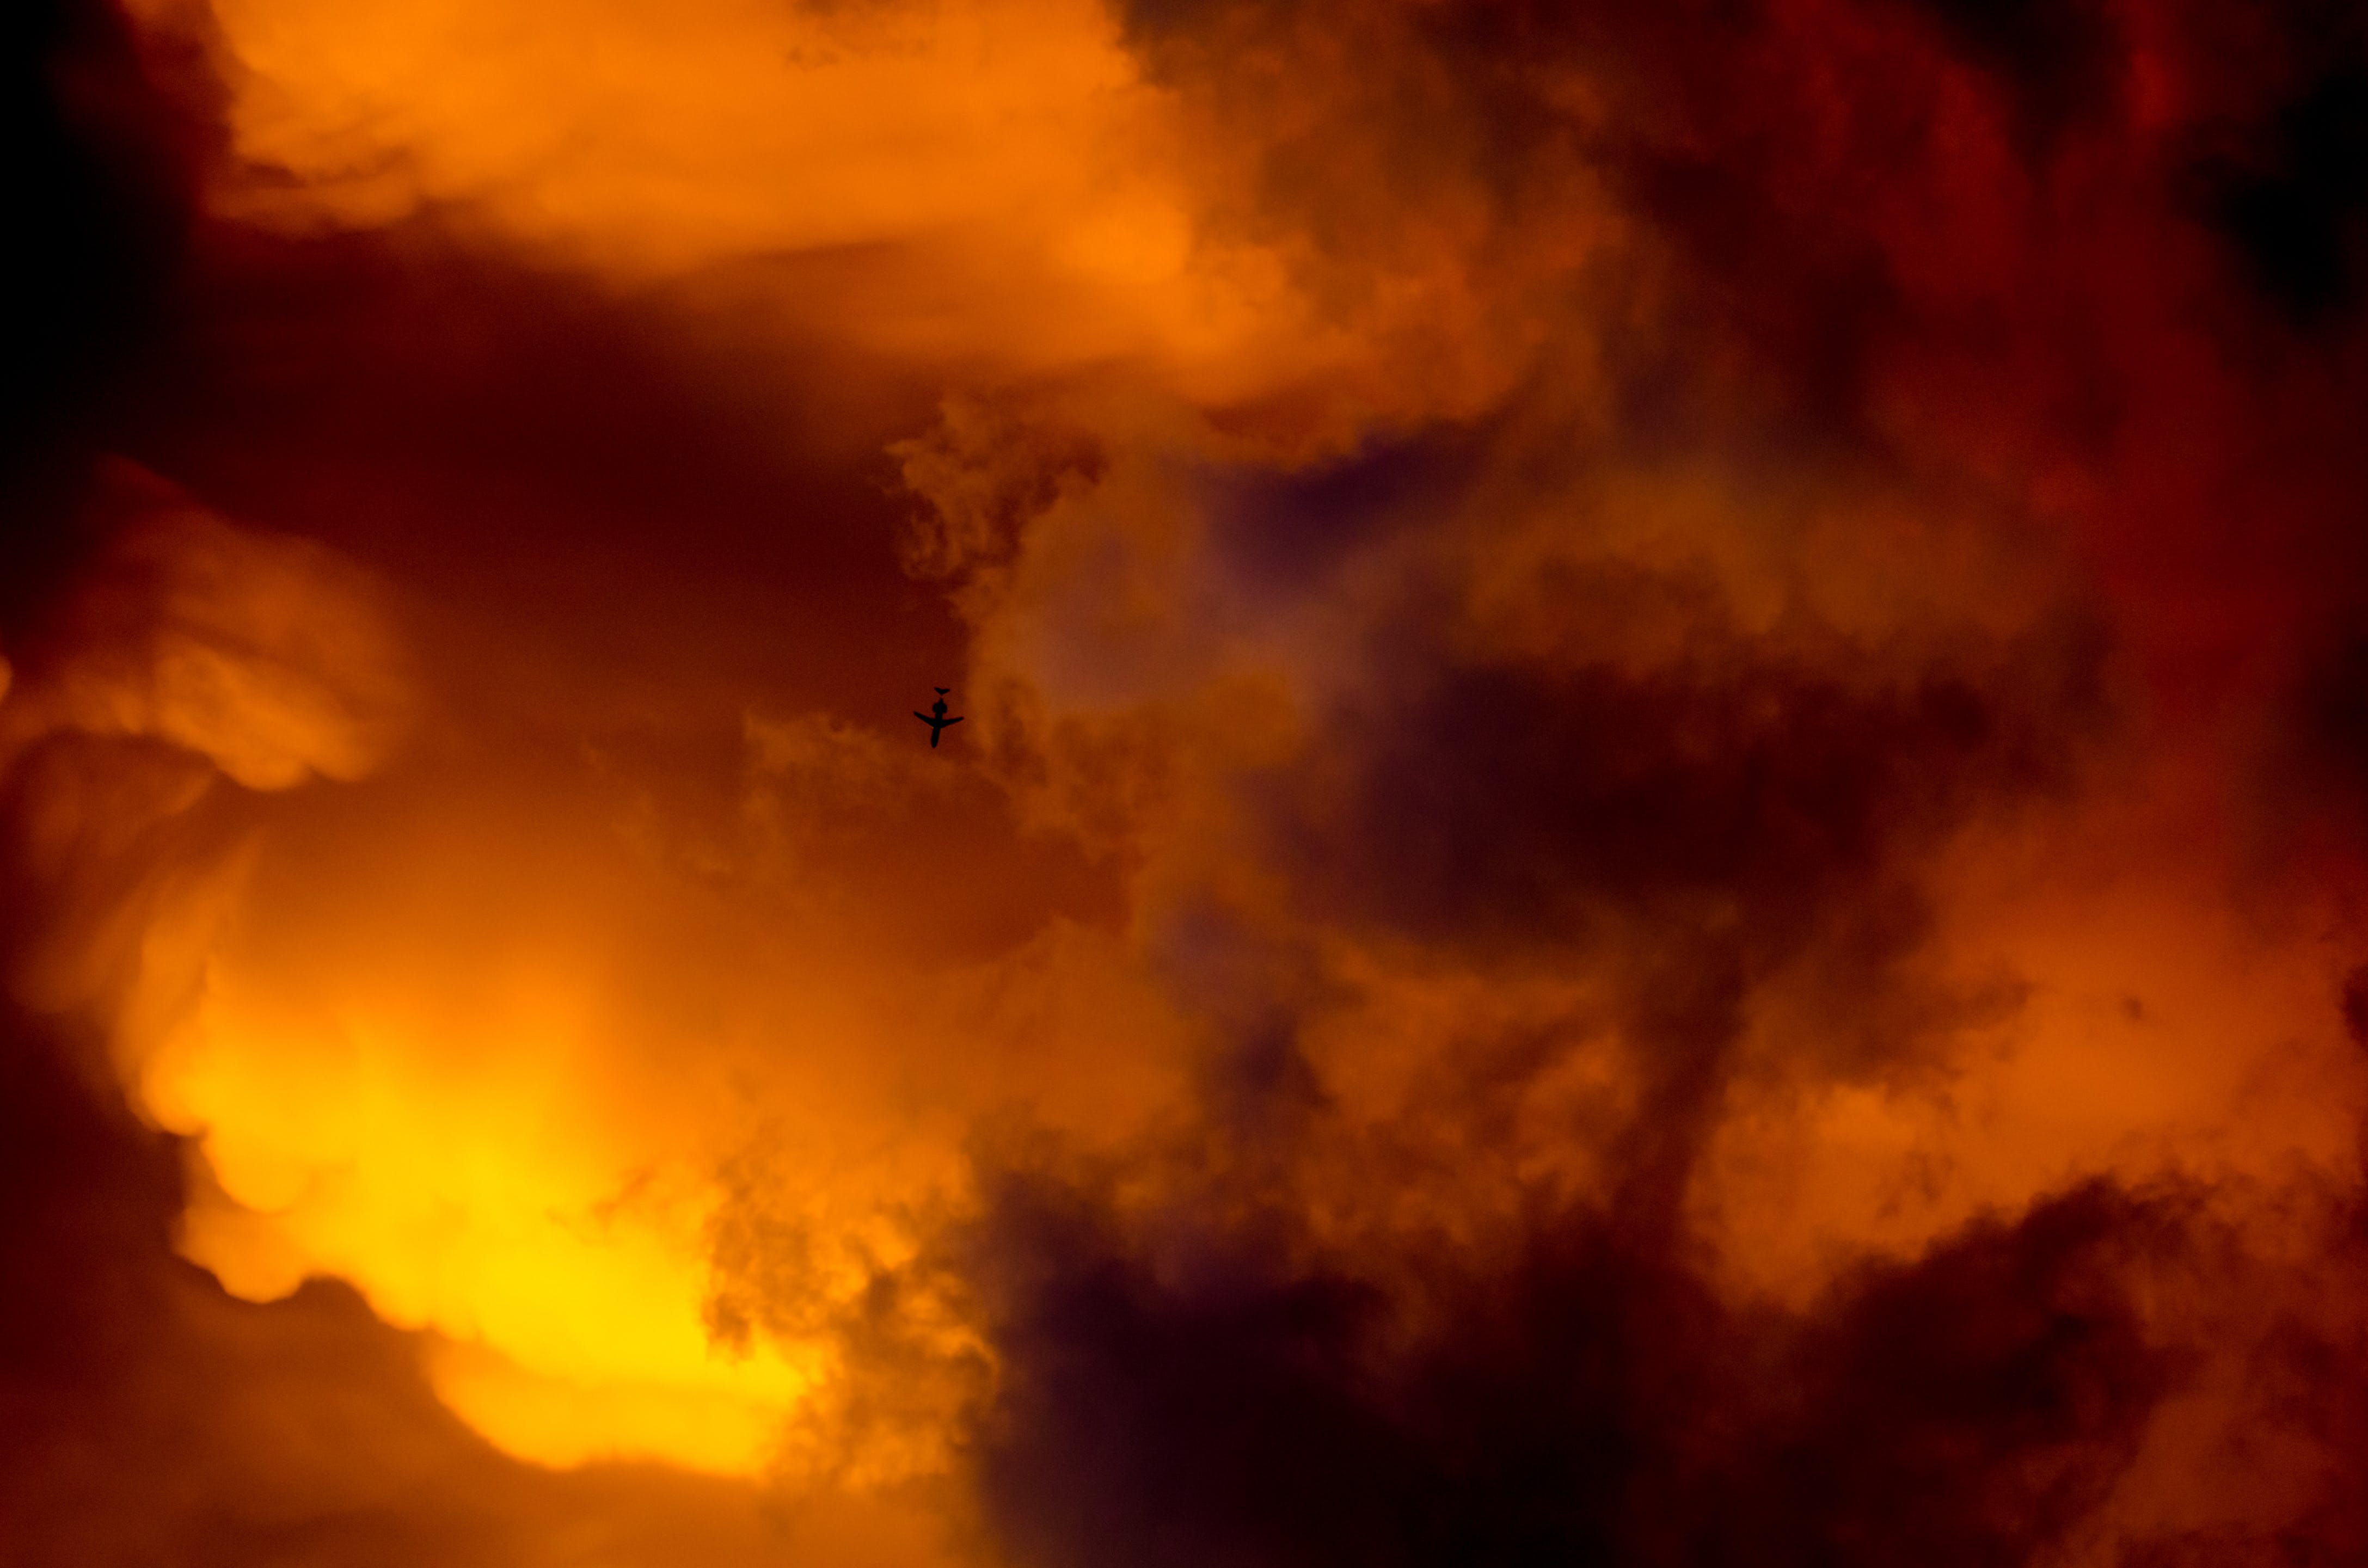 Airplane Silhouette and Orange Sky